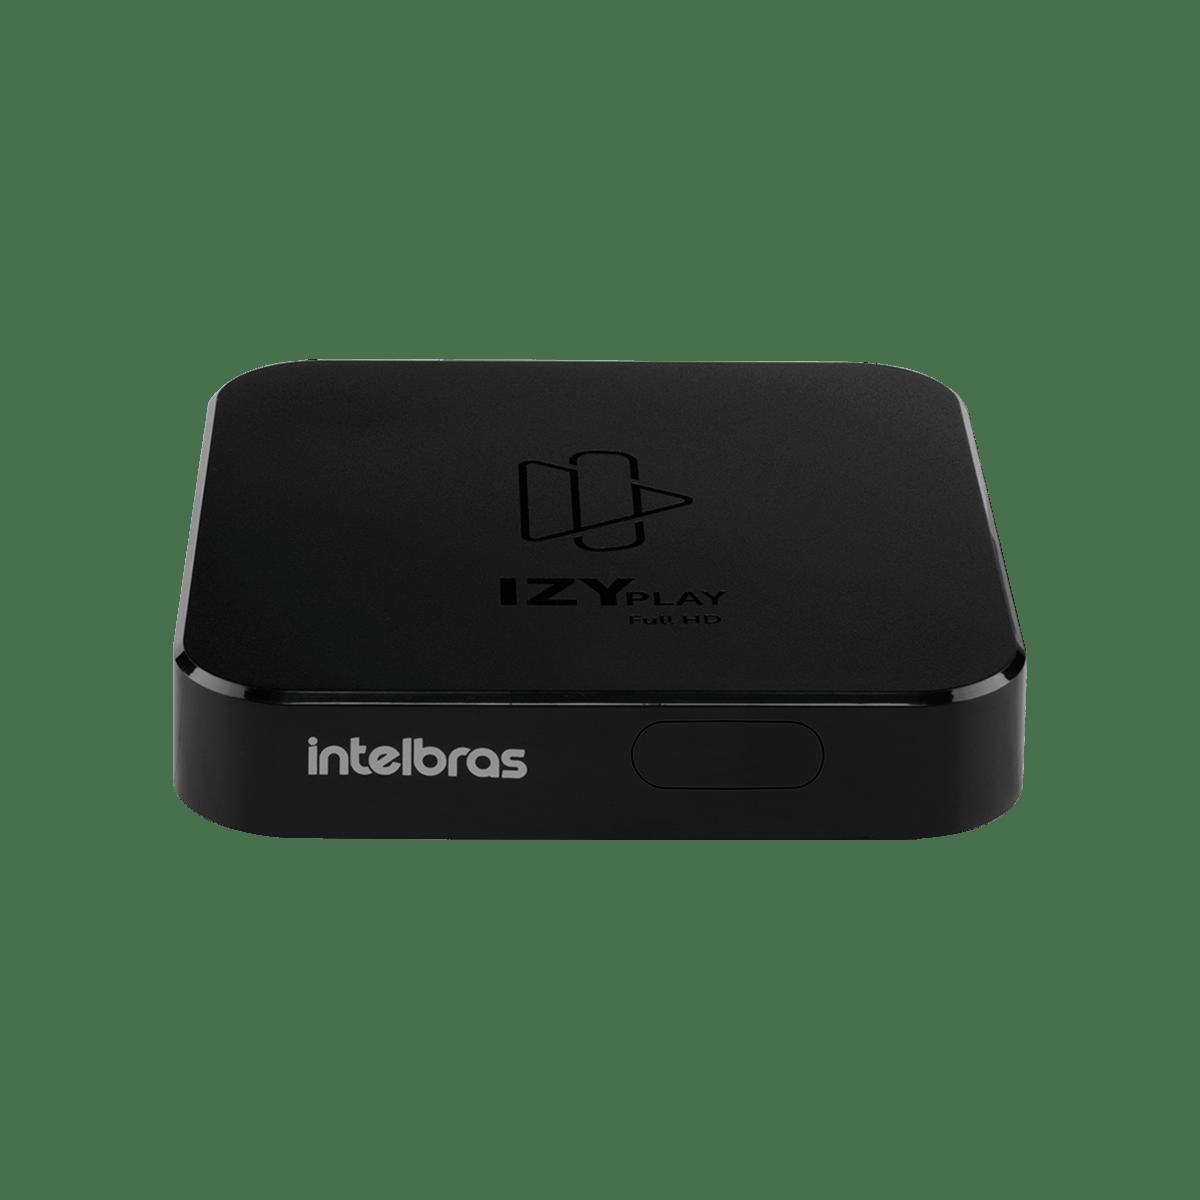 Smart Box Android TV Intelbras IZY Play